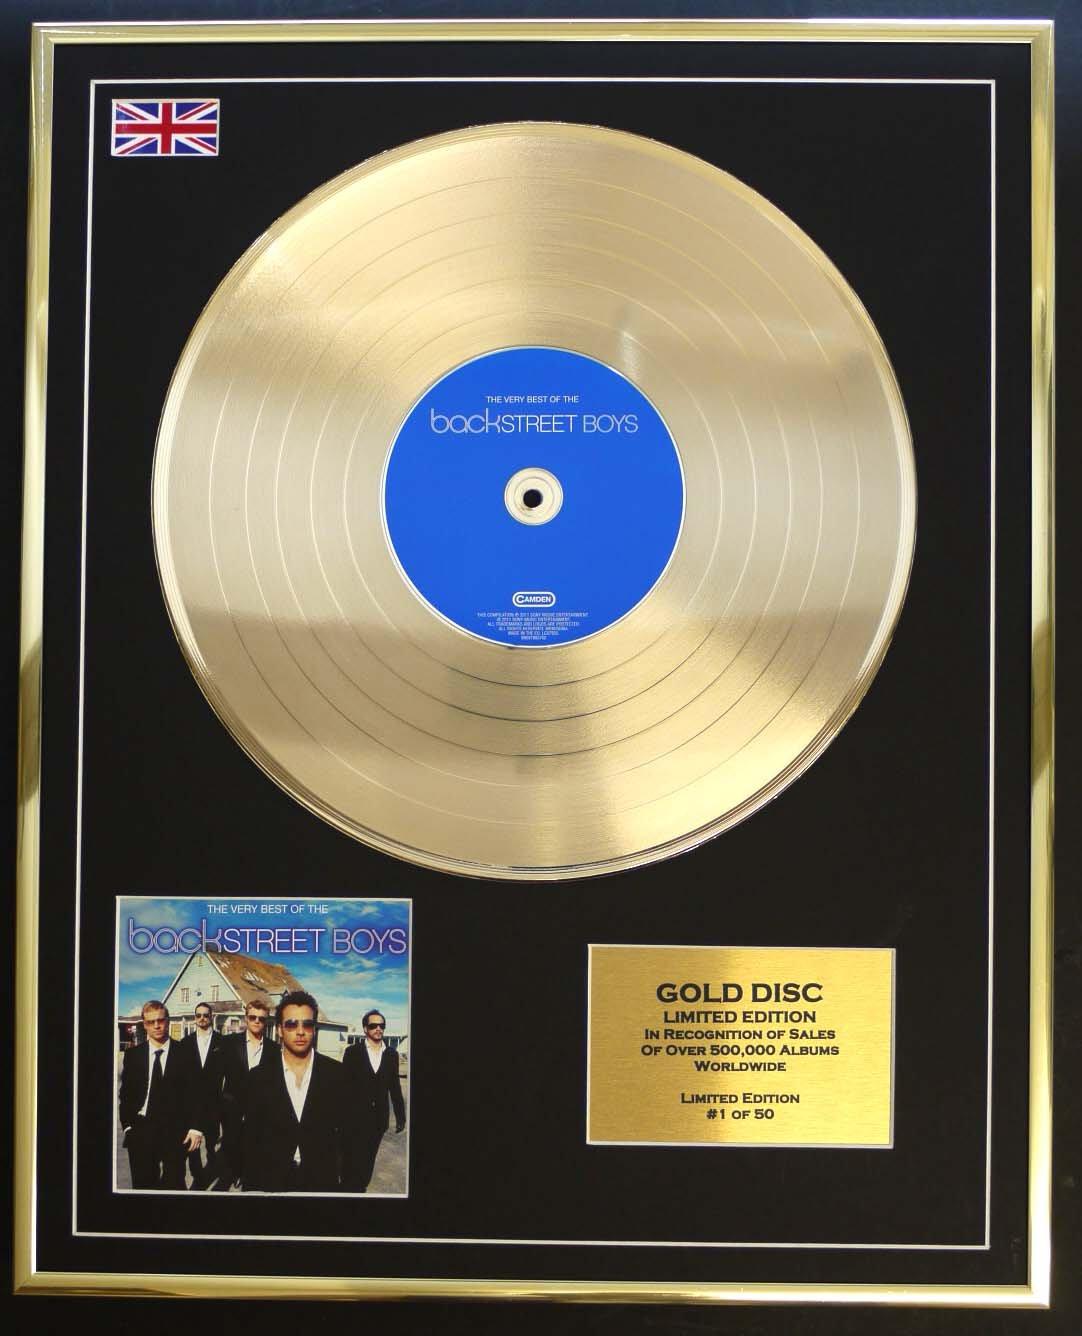 BACKSTREET BOYS//Goldene Schallplatte Record Limitierte Edition//THE VERY BEST OF